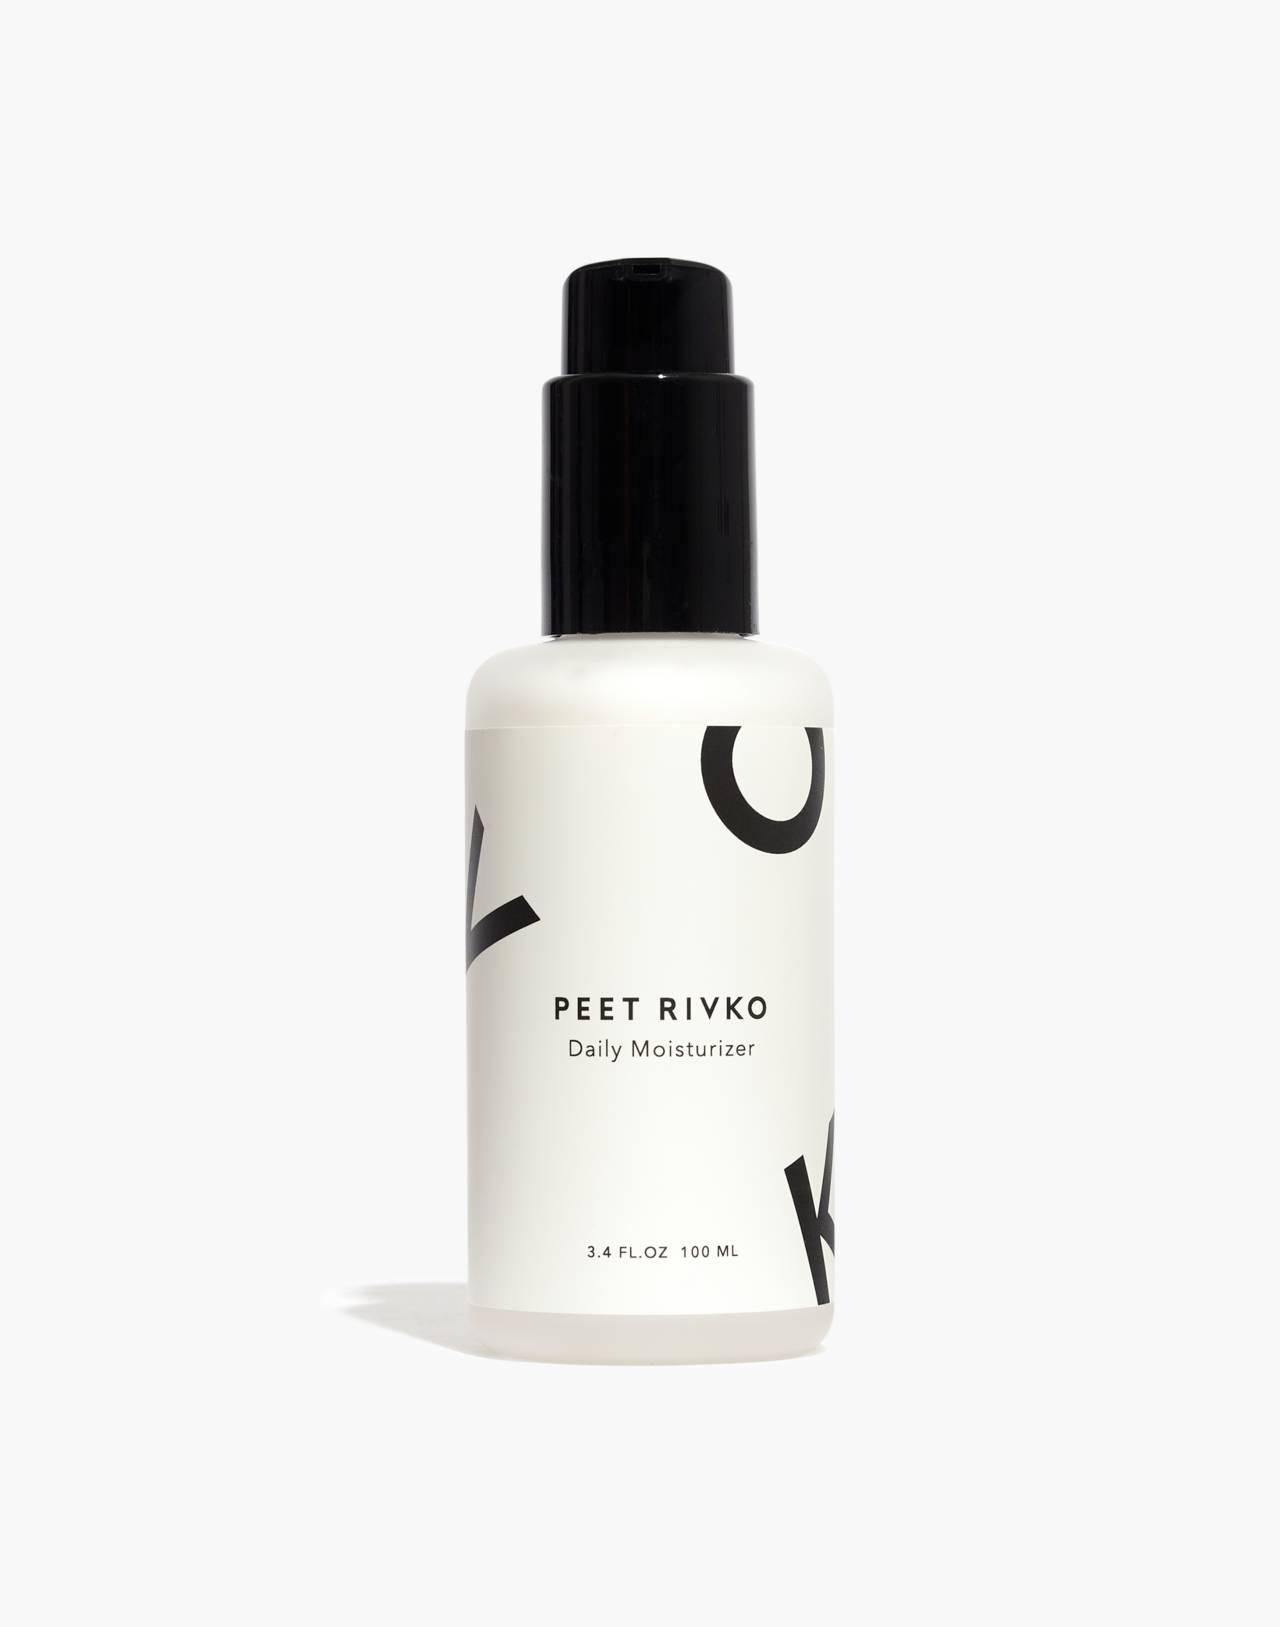 Peet Rivko® Daily Moisturizer in moisturizer image 1